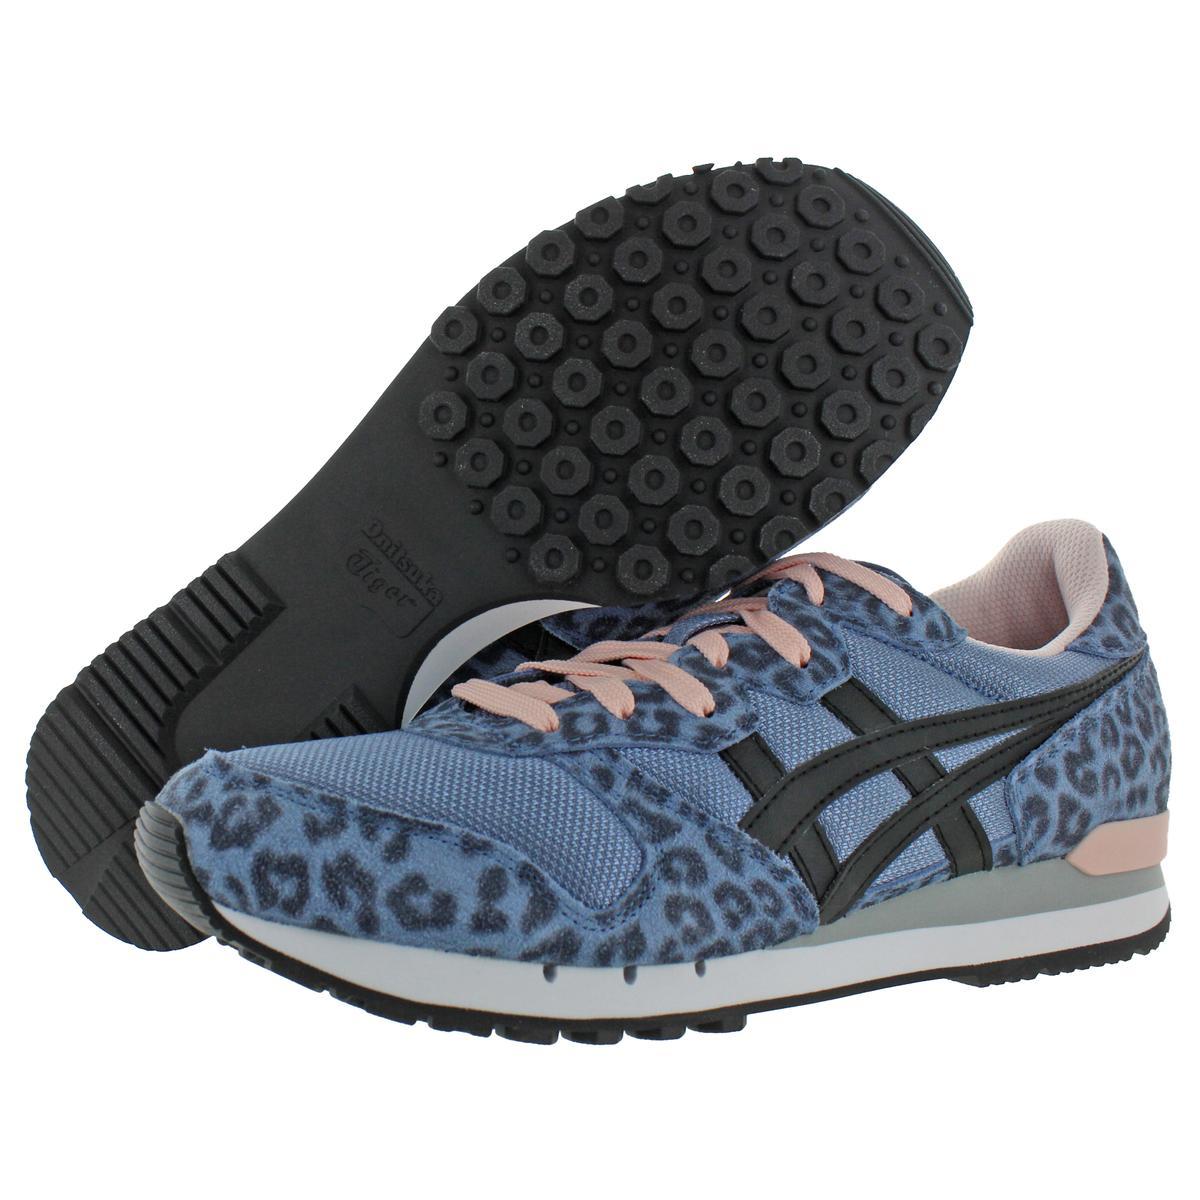 Onitsuka-Tiger-Womens-Alvarado-Running-Cross-Training-Shoes-Sneakers-BHFO-0313 thumbnail 6